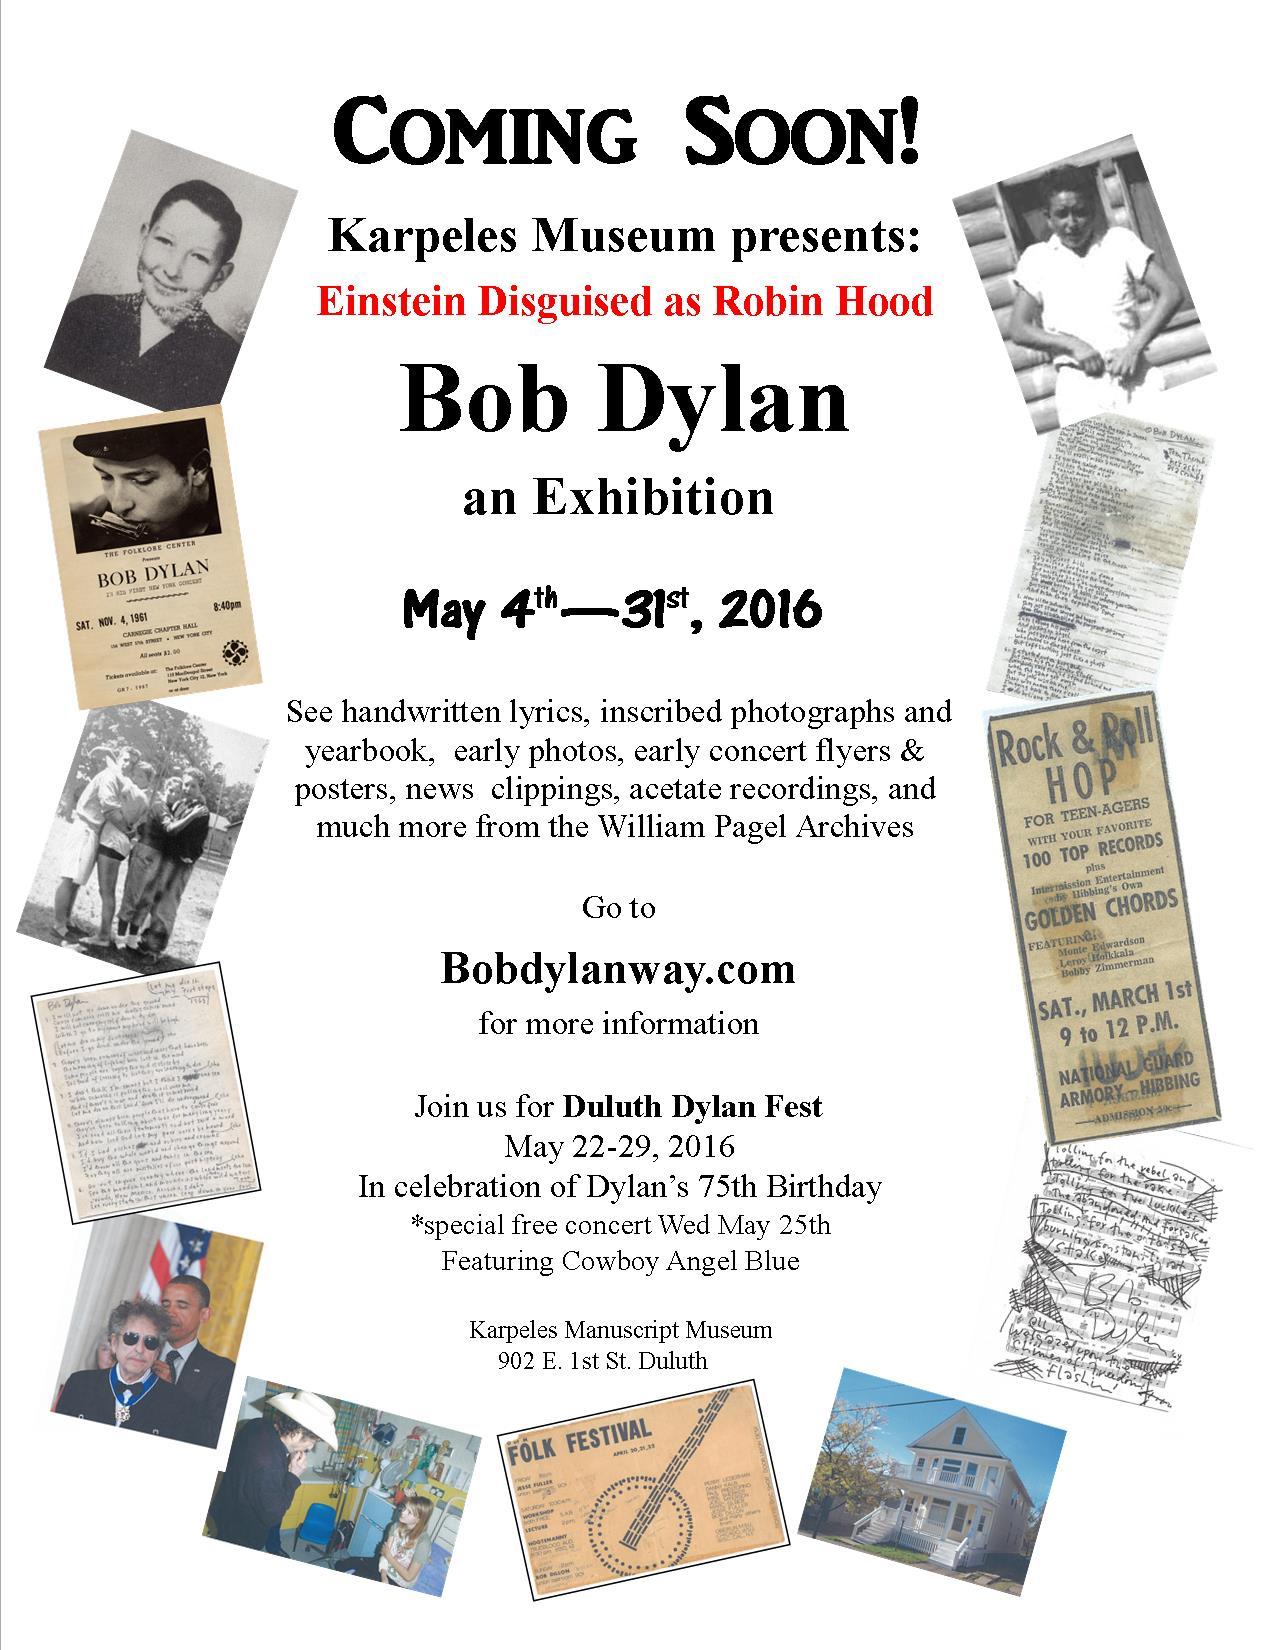 New exhibit at Duluth's Karpeles Museum features Dylan memorabilia